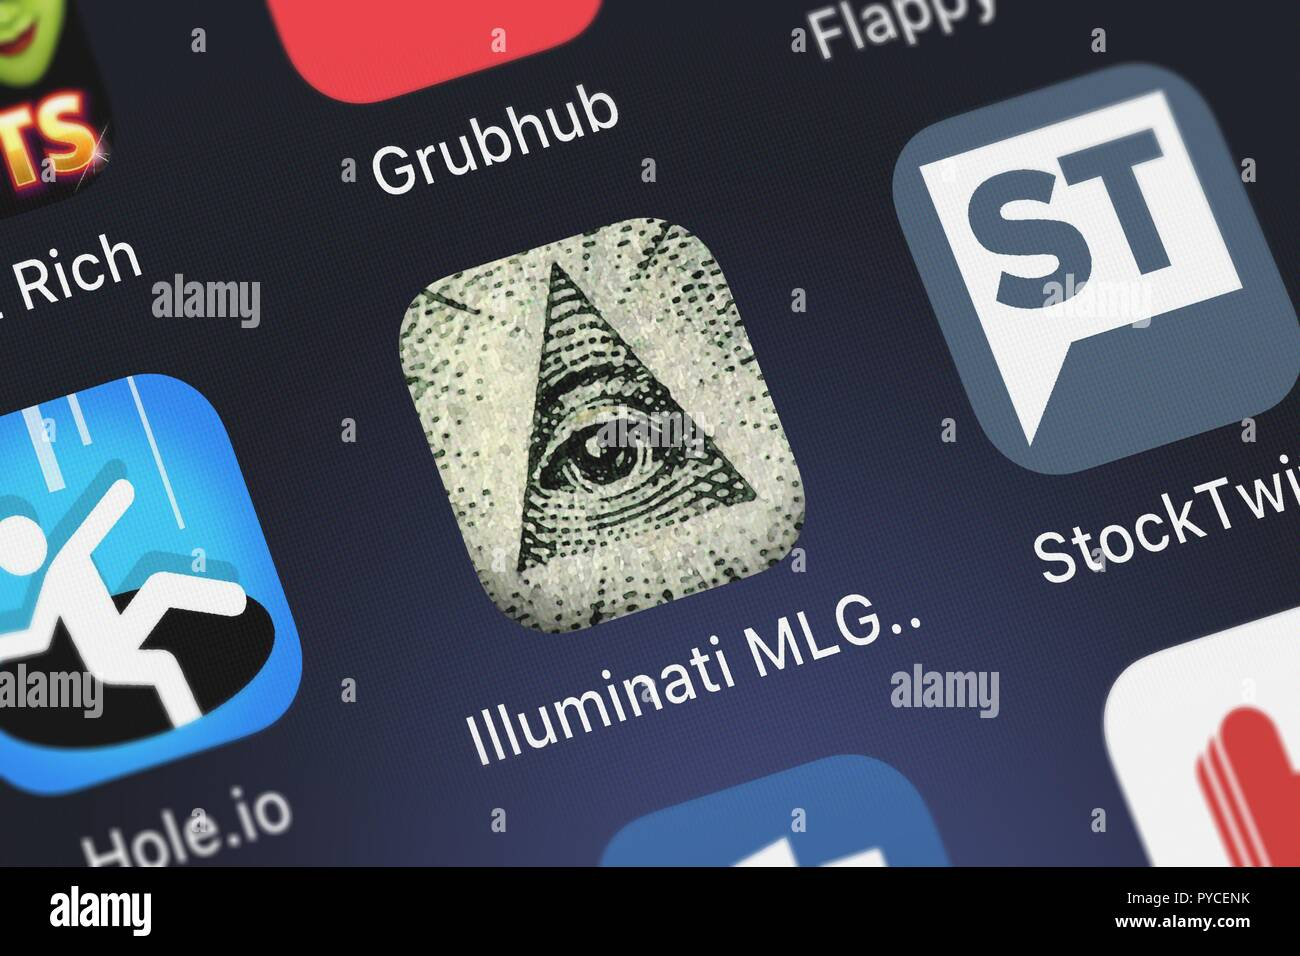 Illuminati Mlg Soundboard Free Stock Photos & Illuminati Mlg